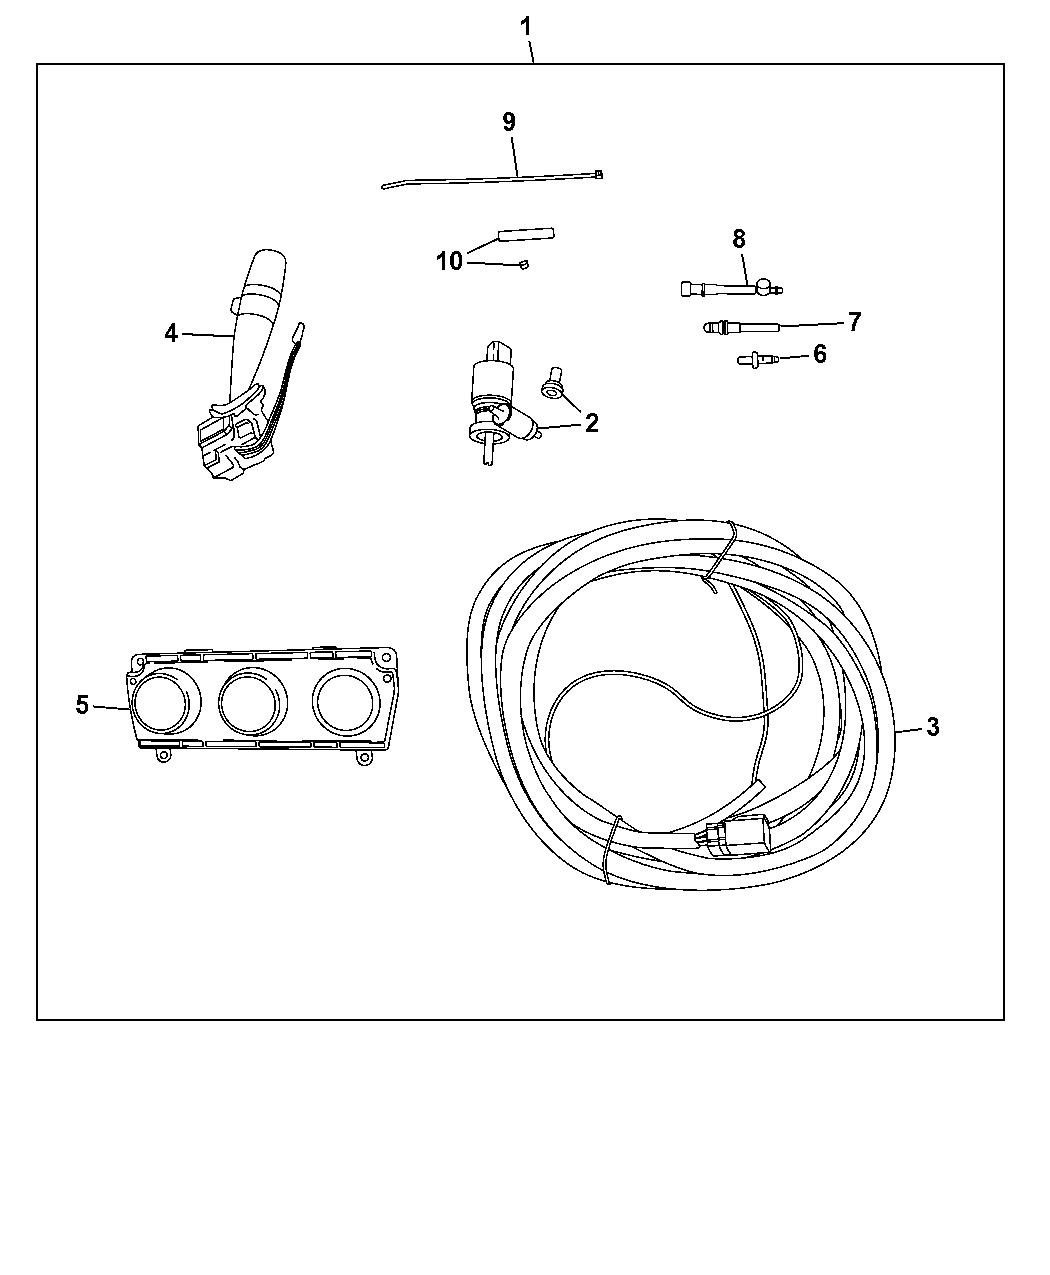 82214392 Genuine Jeep Hard Top Wiring Diagram 2017 Wrangler